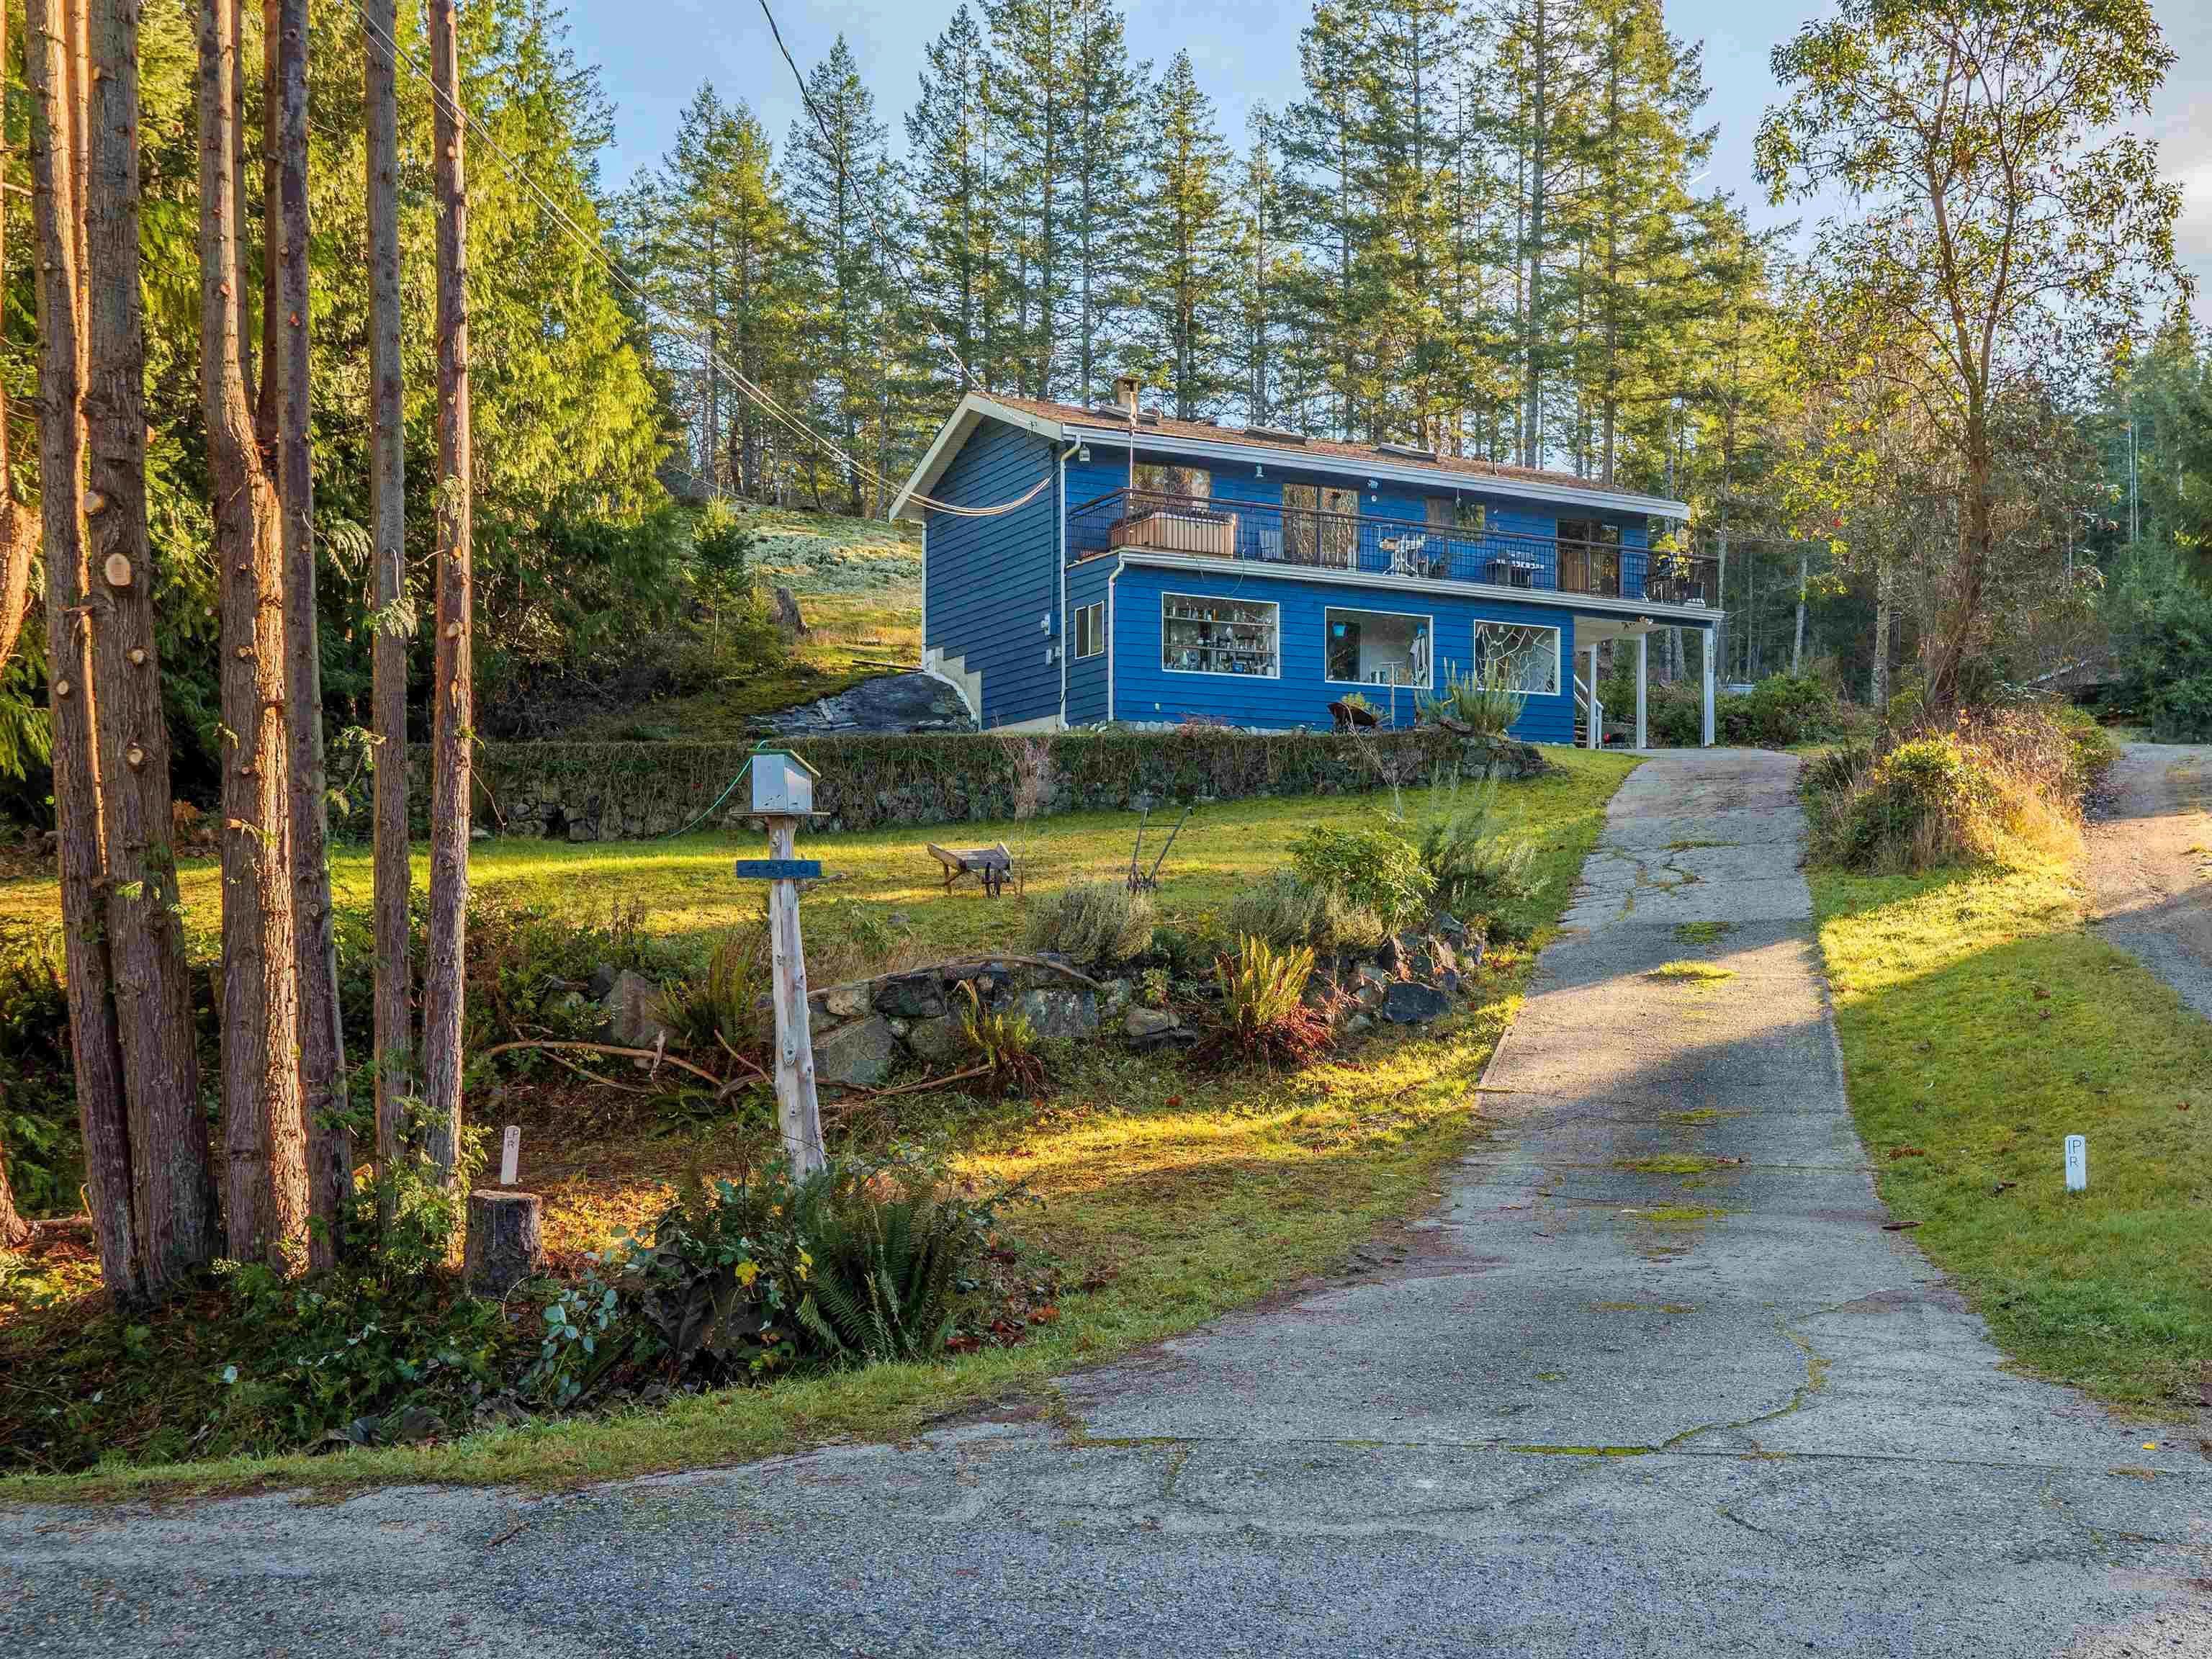 Main Photo: 4460 MCLINTOCK Road in Madeira Park: Pender Harbour Egmont House for sale (Sunshine Coast)  : MLS®# R2625189